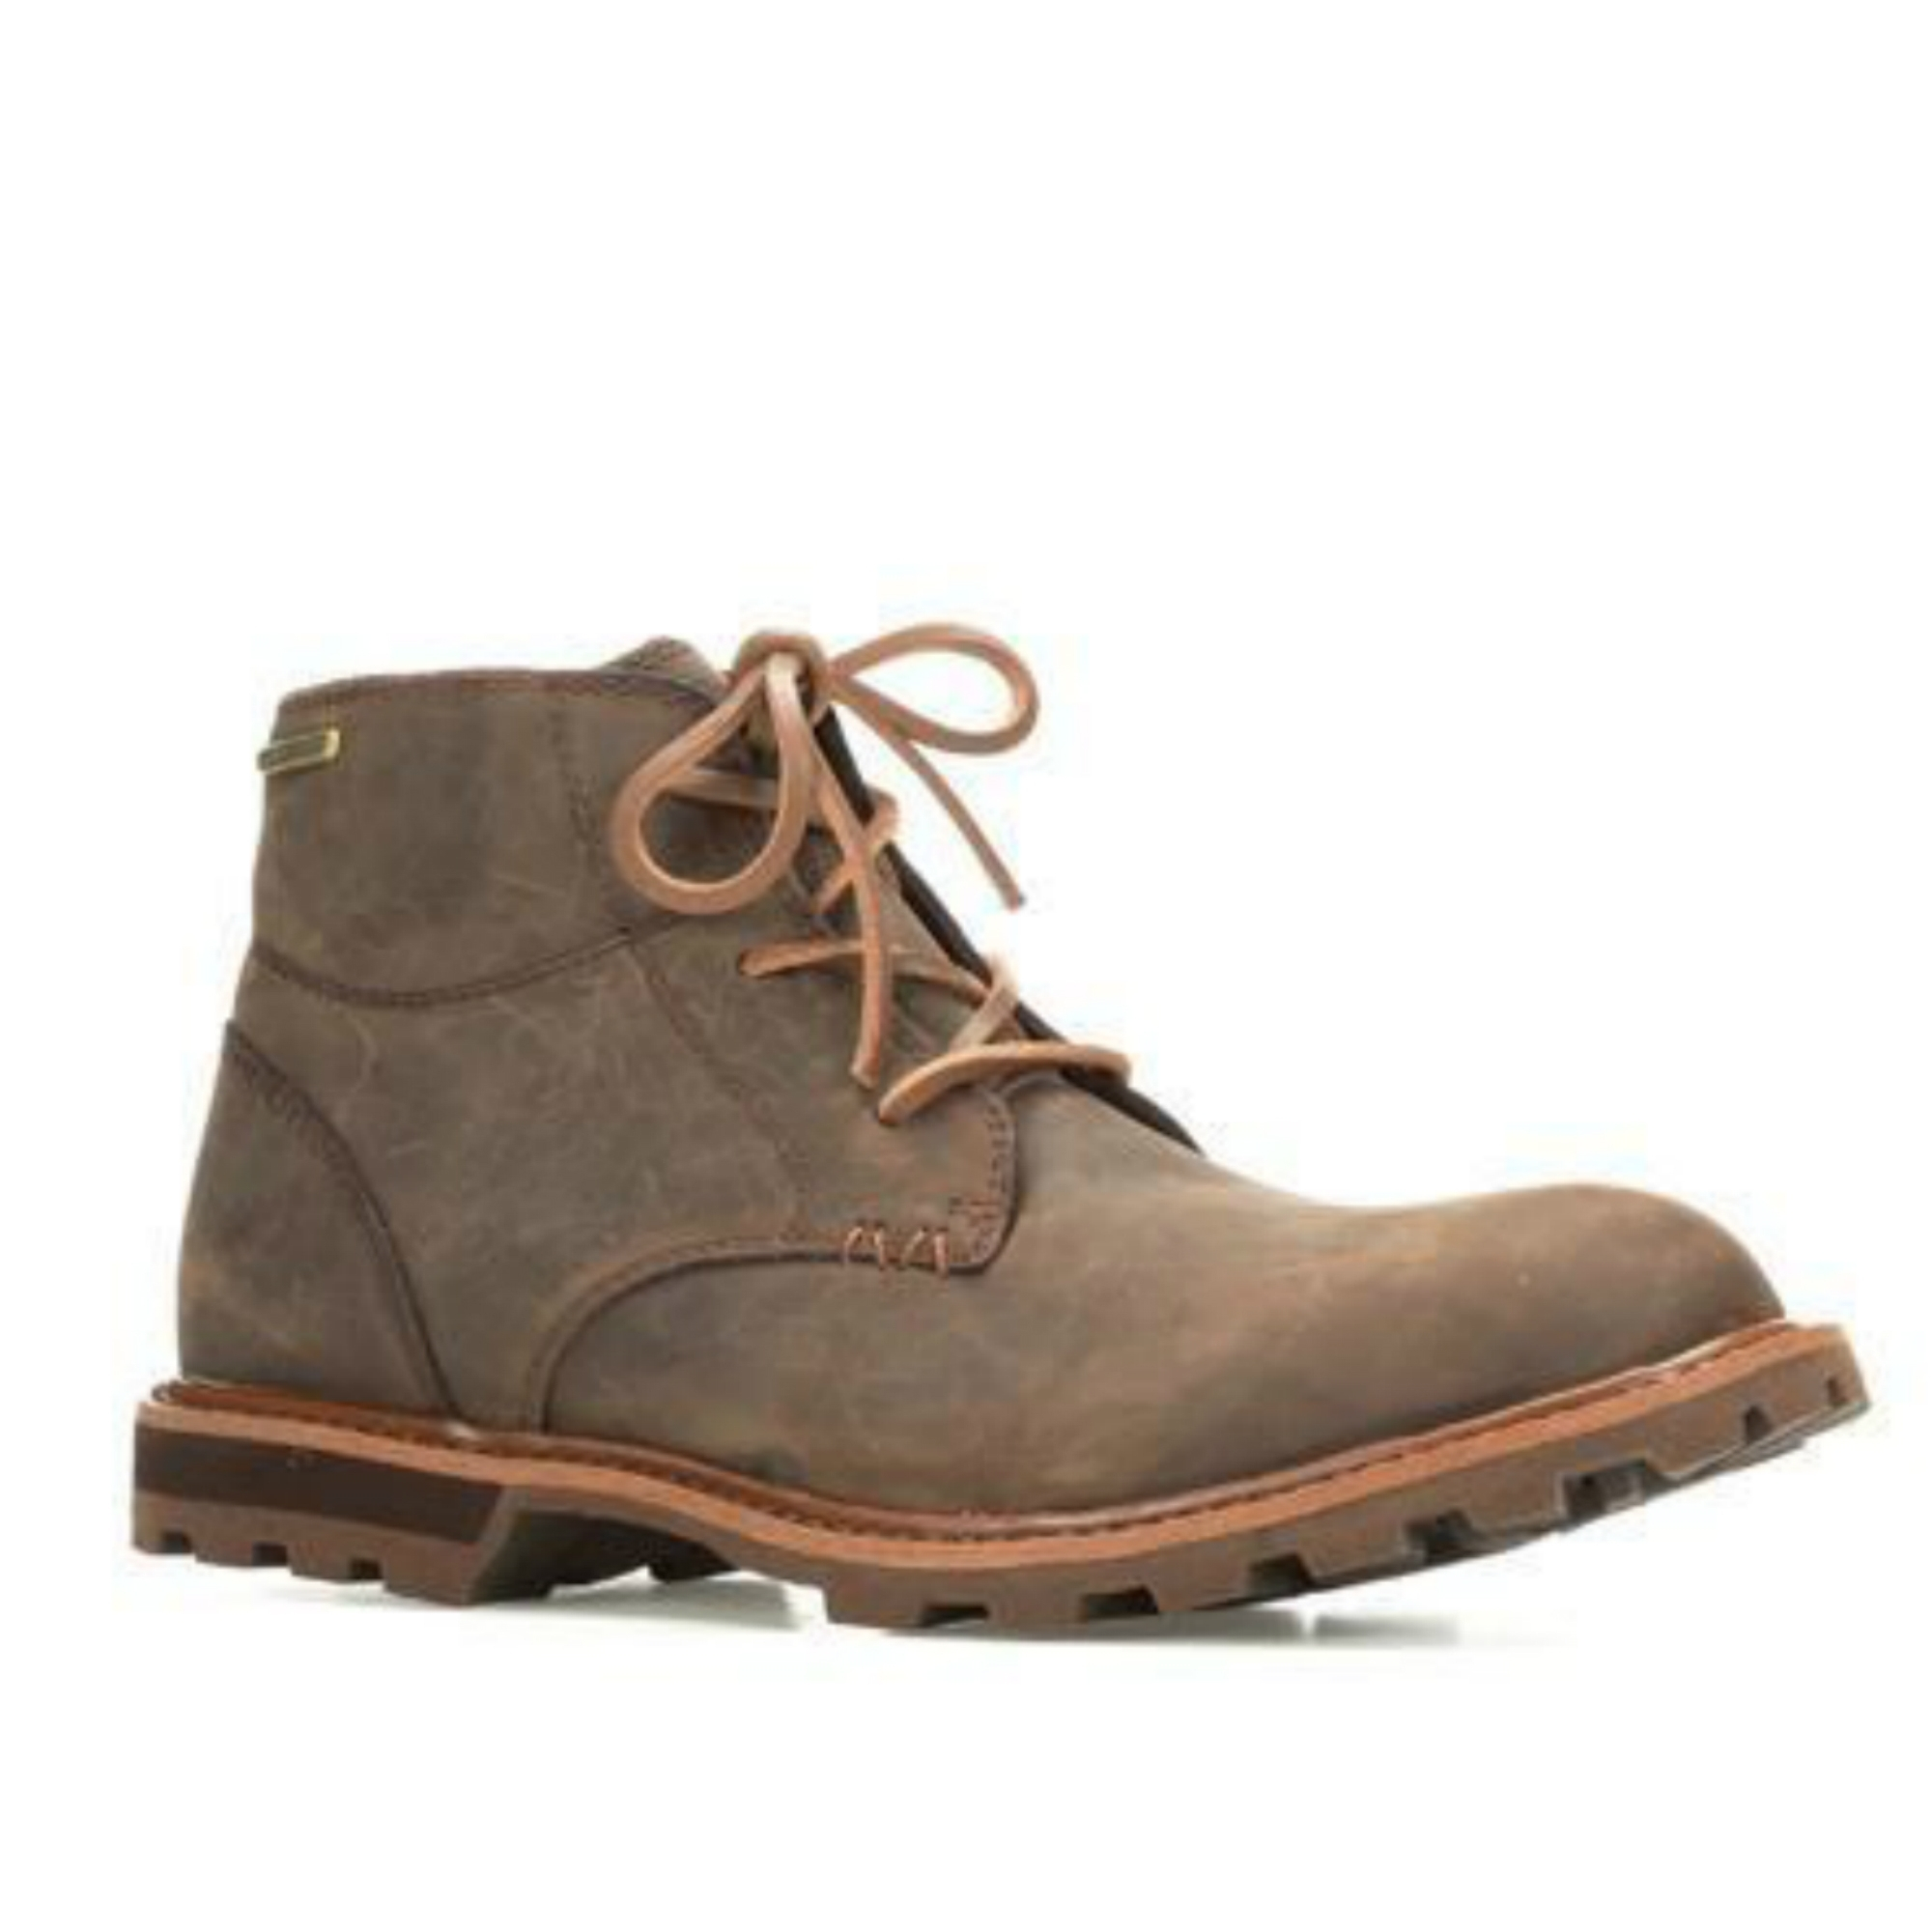 Muck Boots Freeman Mens Waterproof Leather Chukka Boots Brown Shuperb